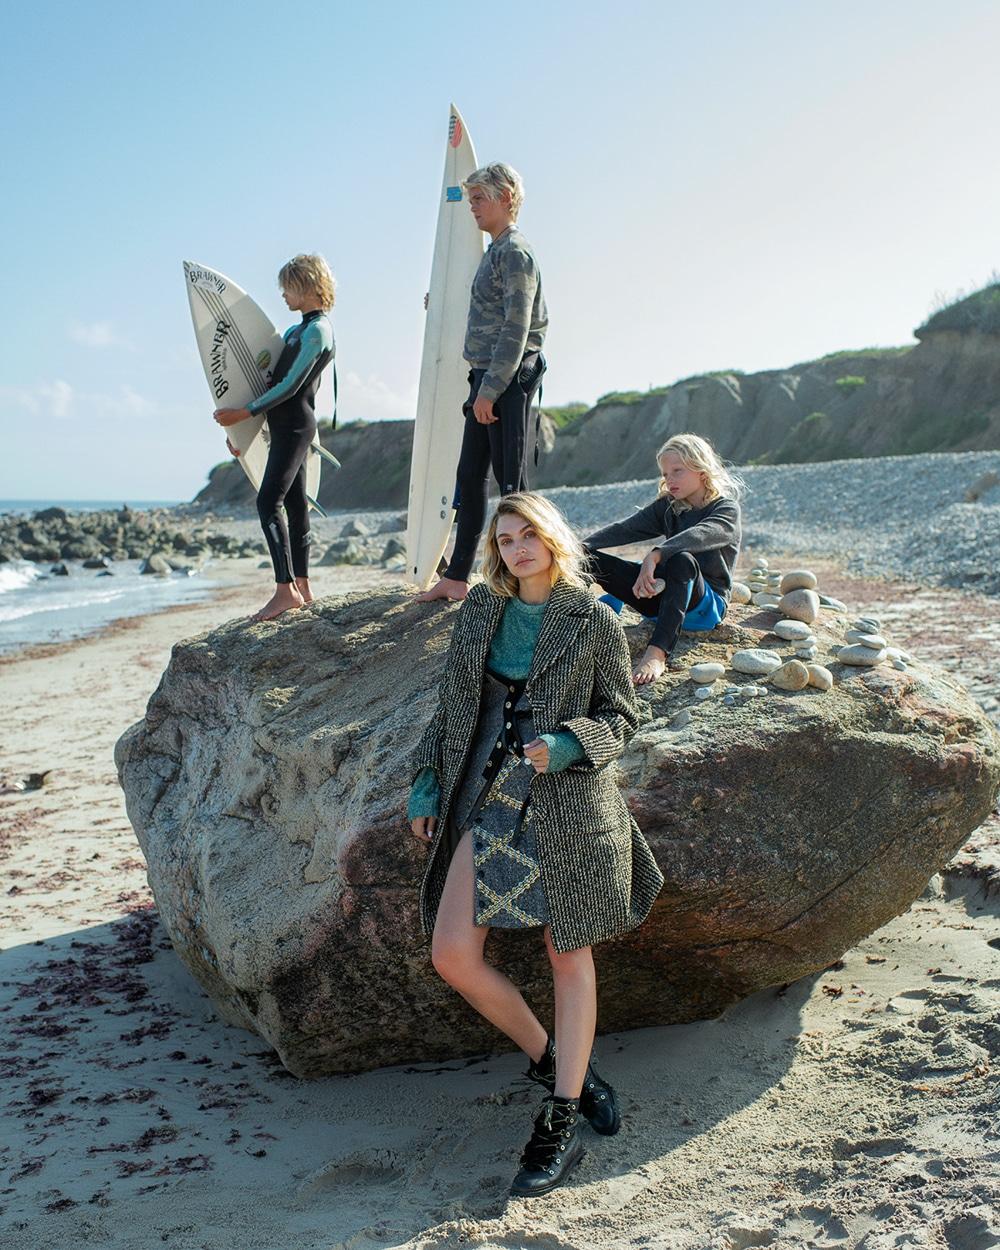 Roosmarijn-De-Kok-The-Gloss-Magazine-Anne-Menke-14.jpg